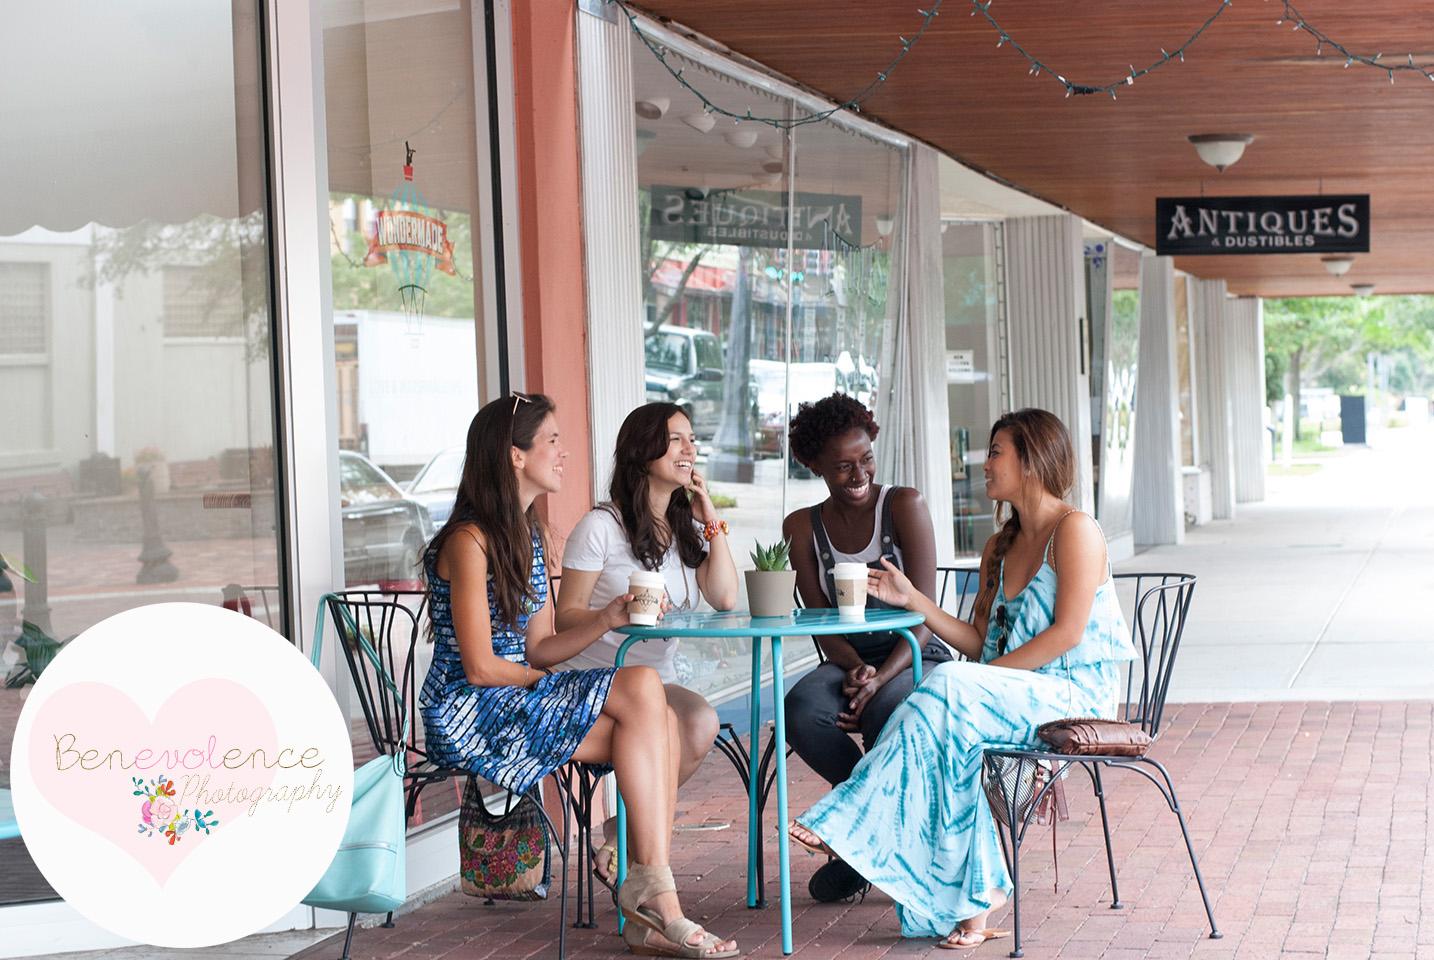 Benevolence Photography in Sanford FL